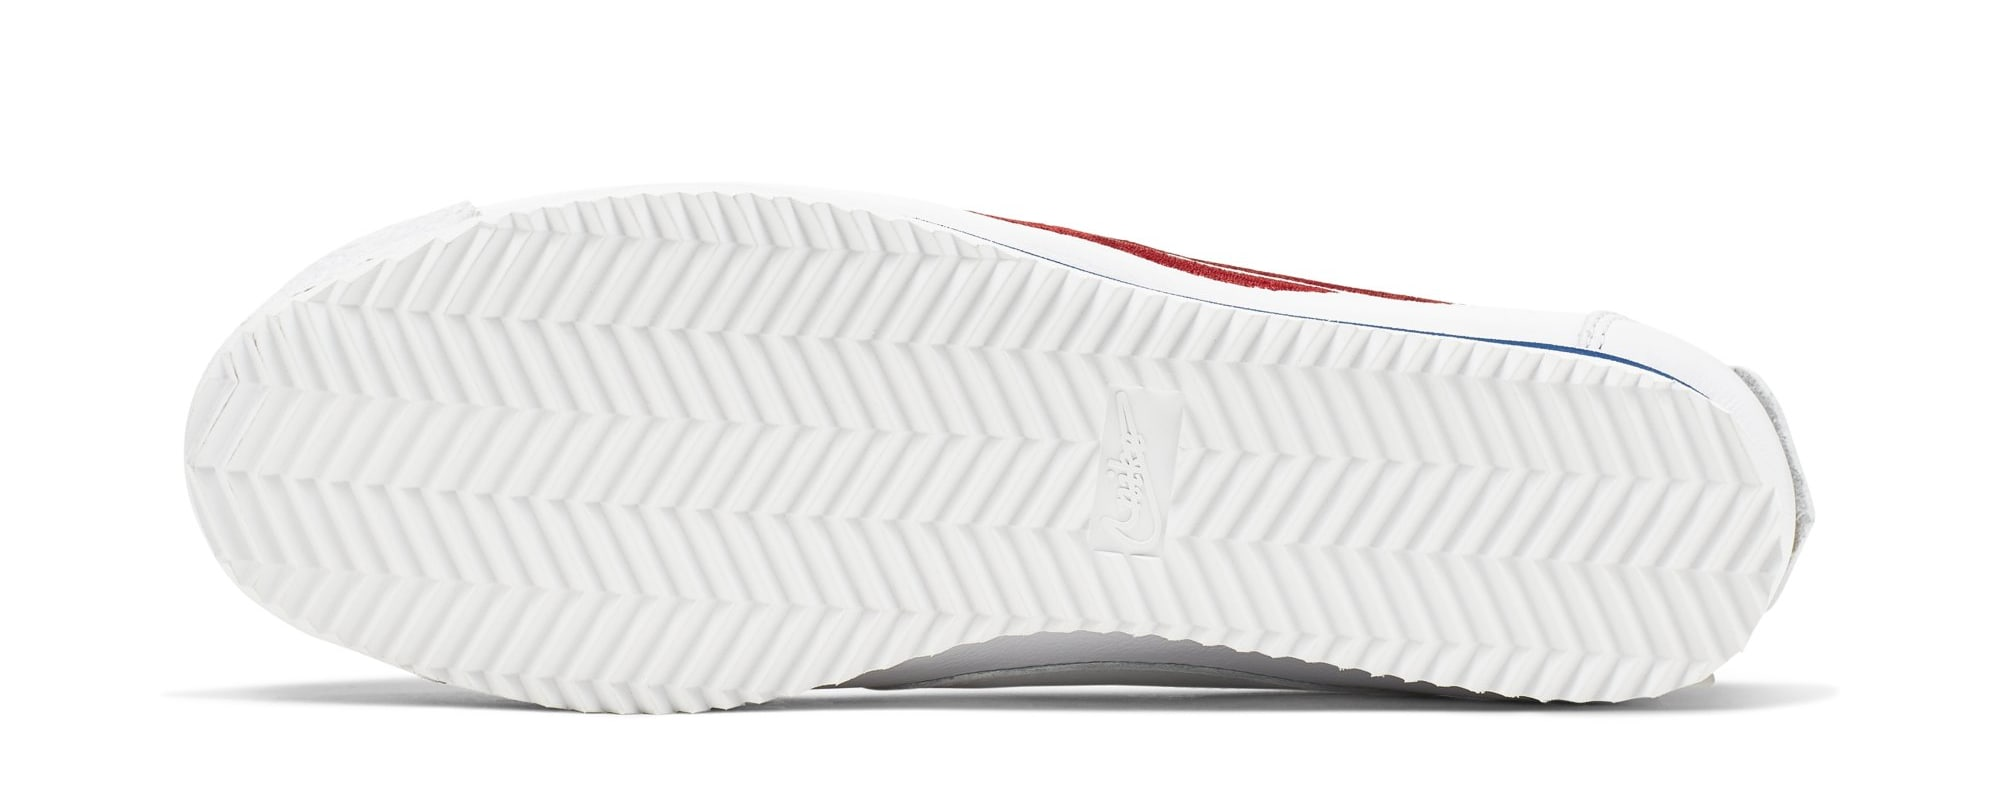 Nike Classic Cortez 'Shoe Dog Pack (Falcon)' CJ2586-101 (Sole)